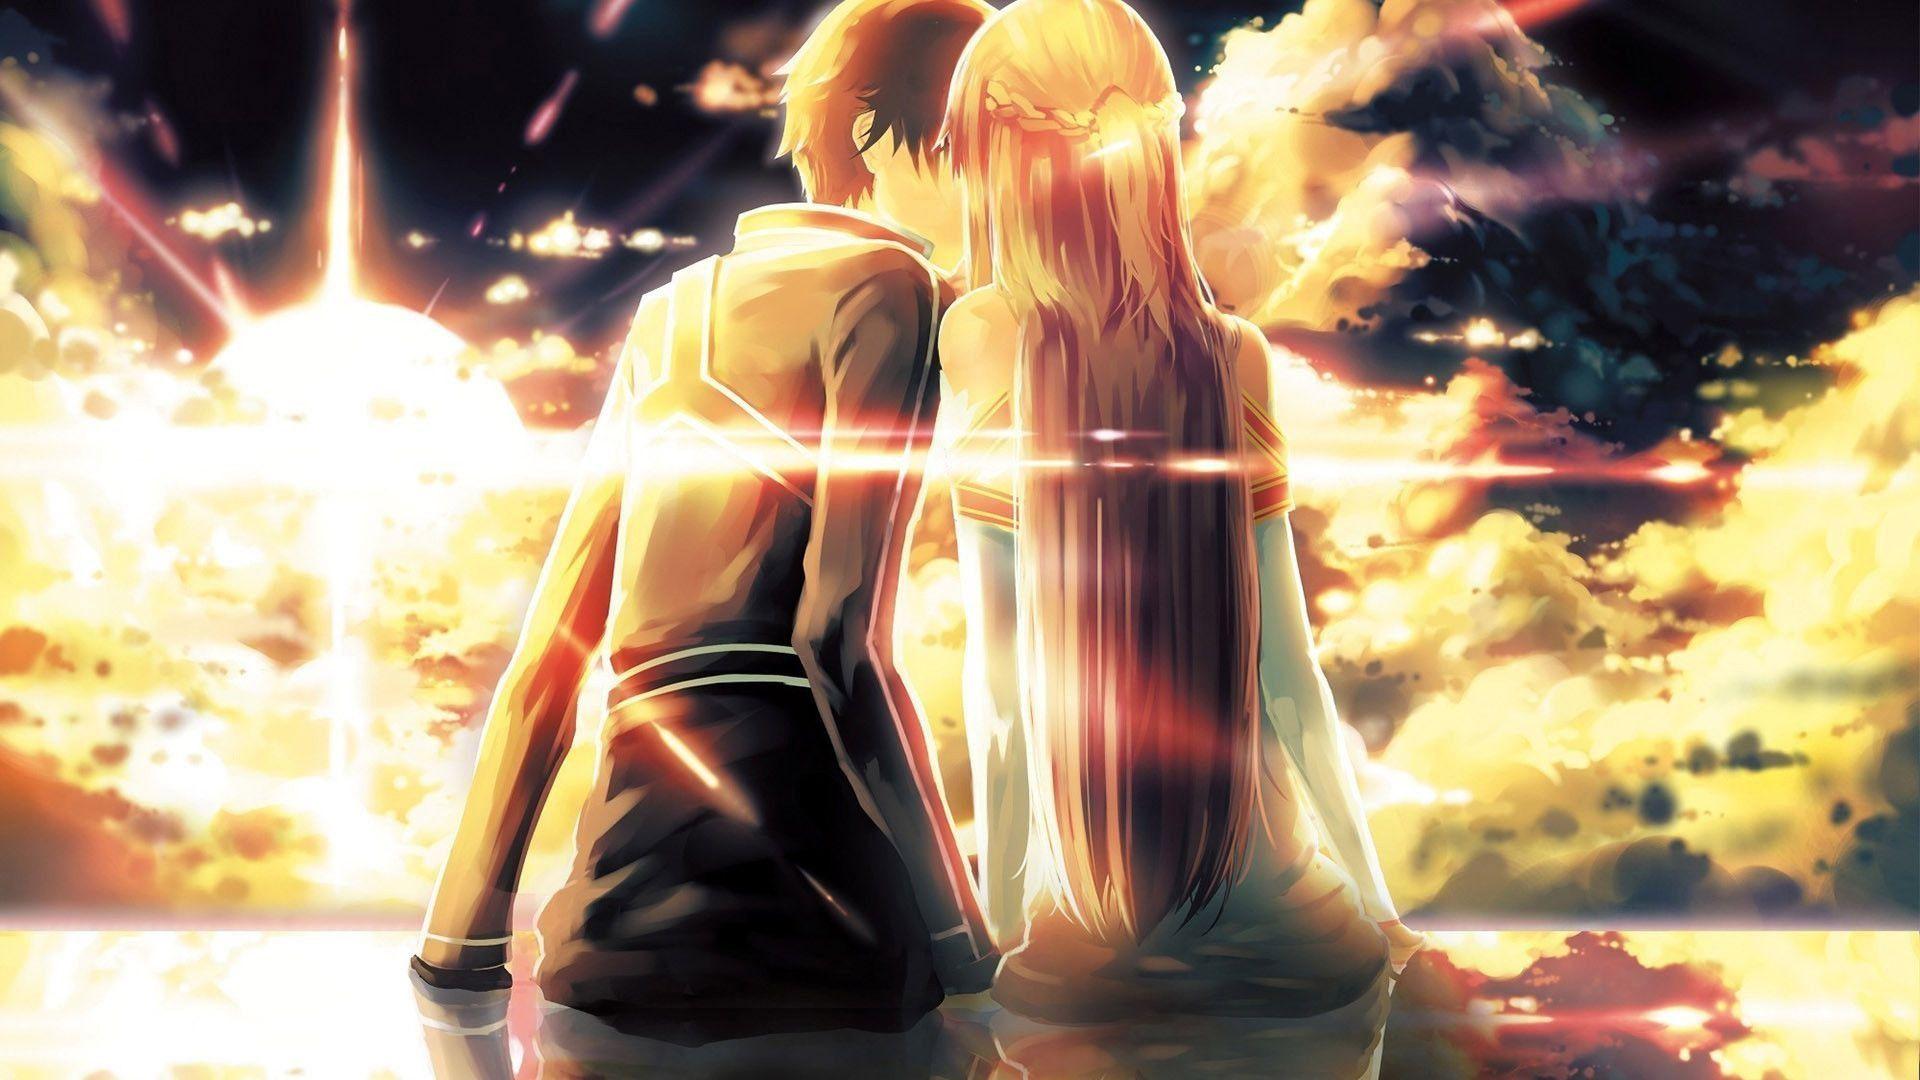 Anime Couple Kissing Hd Wallpaper 2516 3963 Wallpaper Spotimg Sword Art Online Kirito Sword Art Online Wallpaper Sword Art